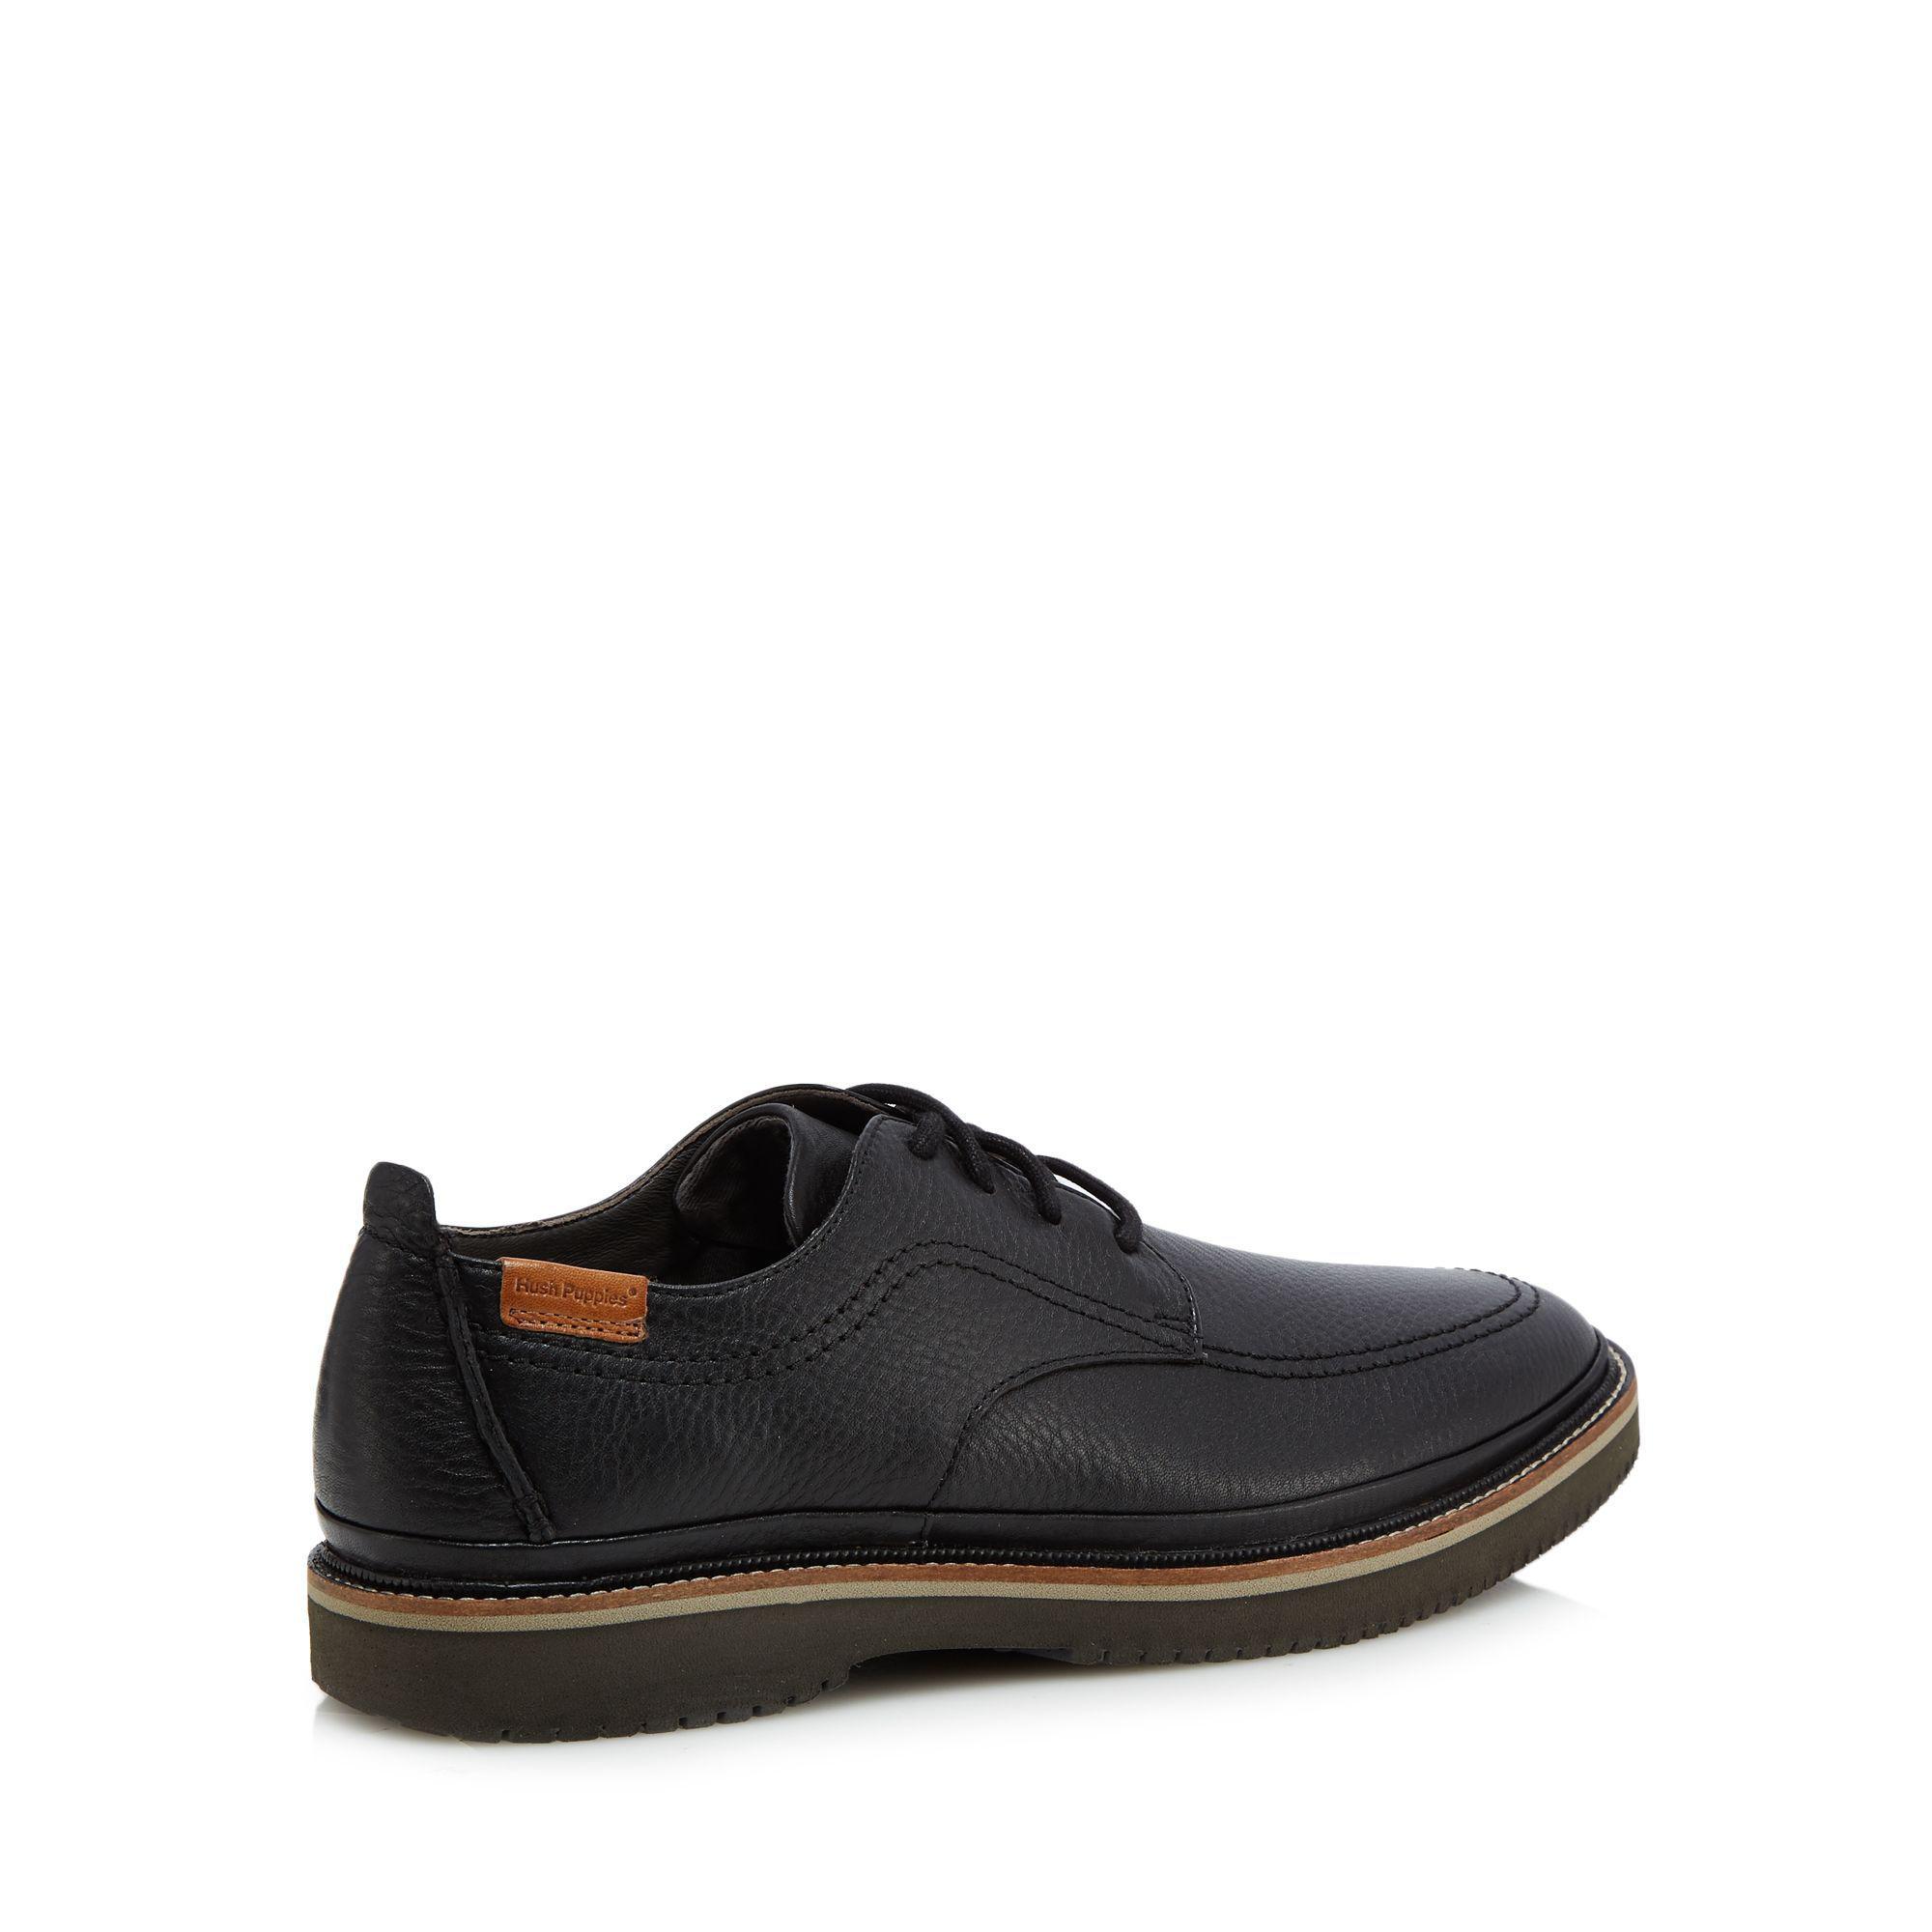 low shipping fee sale online Black leather 'Kurt Bernard' Derby shoes limited edition sale online free shipping best place online Shop AFK5l33